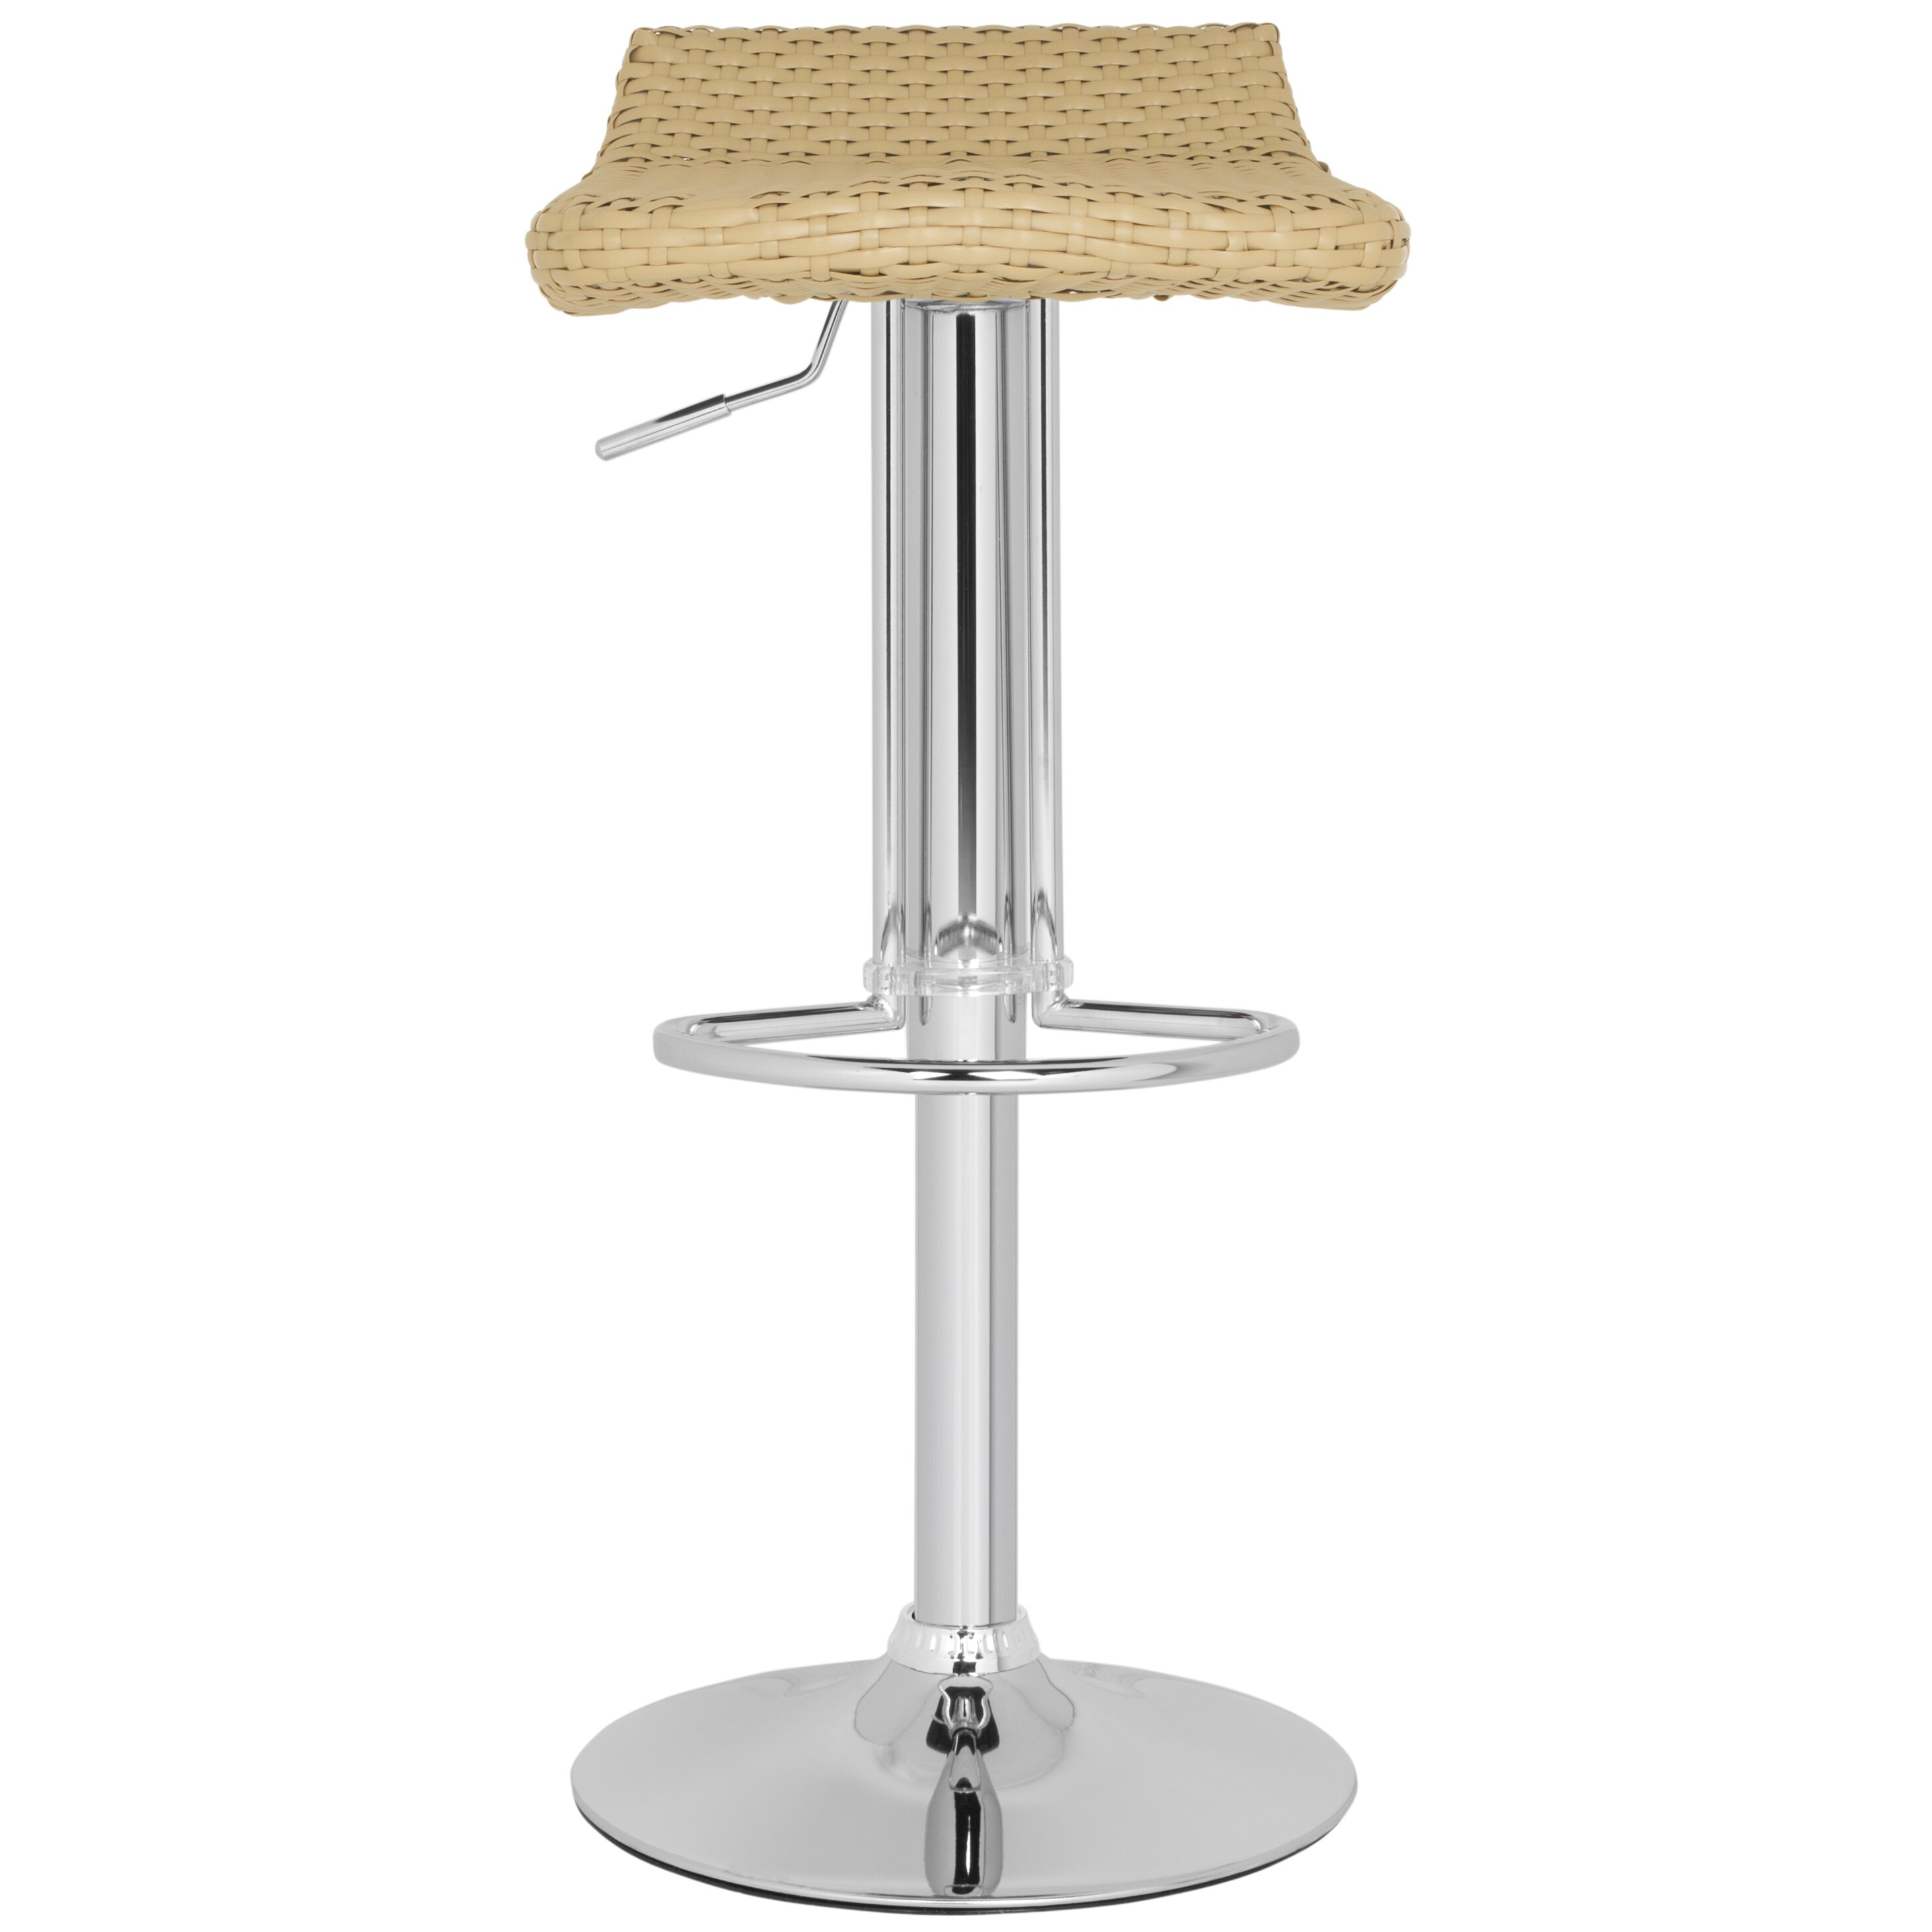 Safavieh Juji Adjustable Height Swivel Bar Stool Amp Reviews